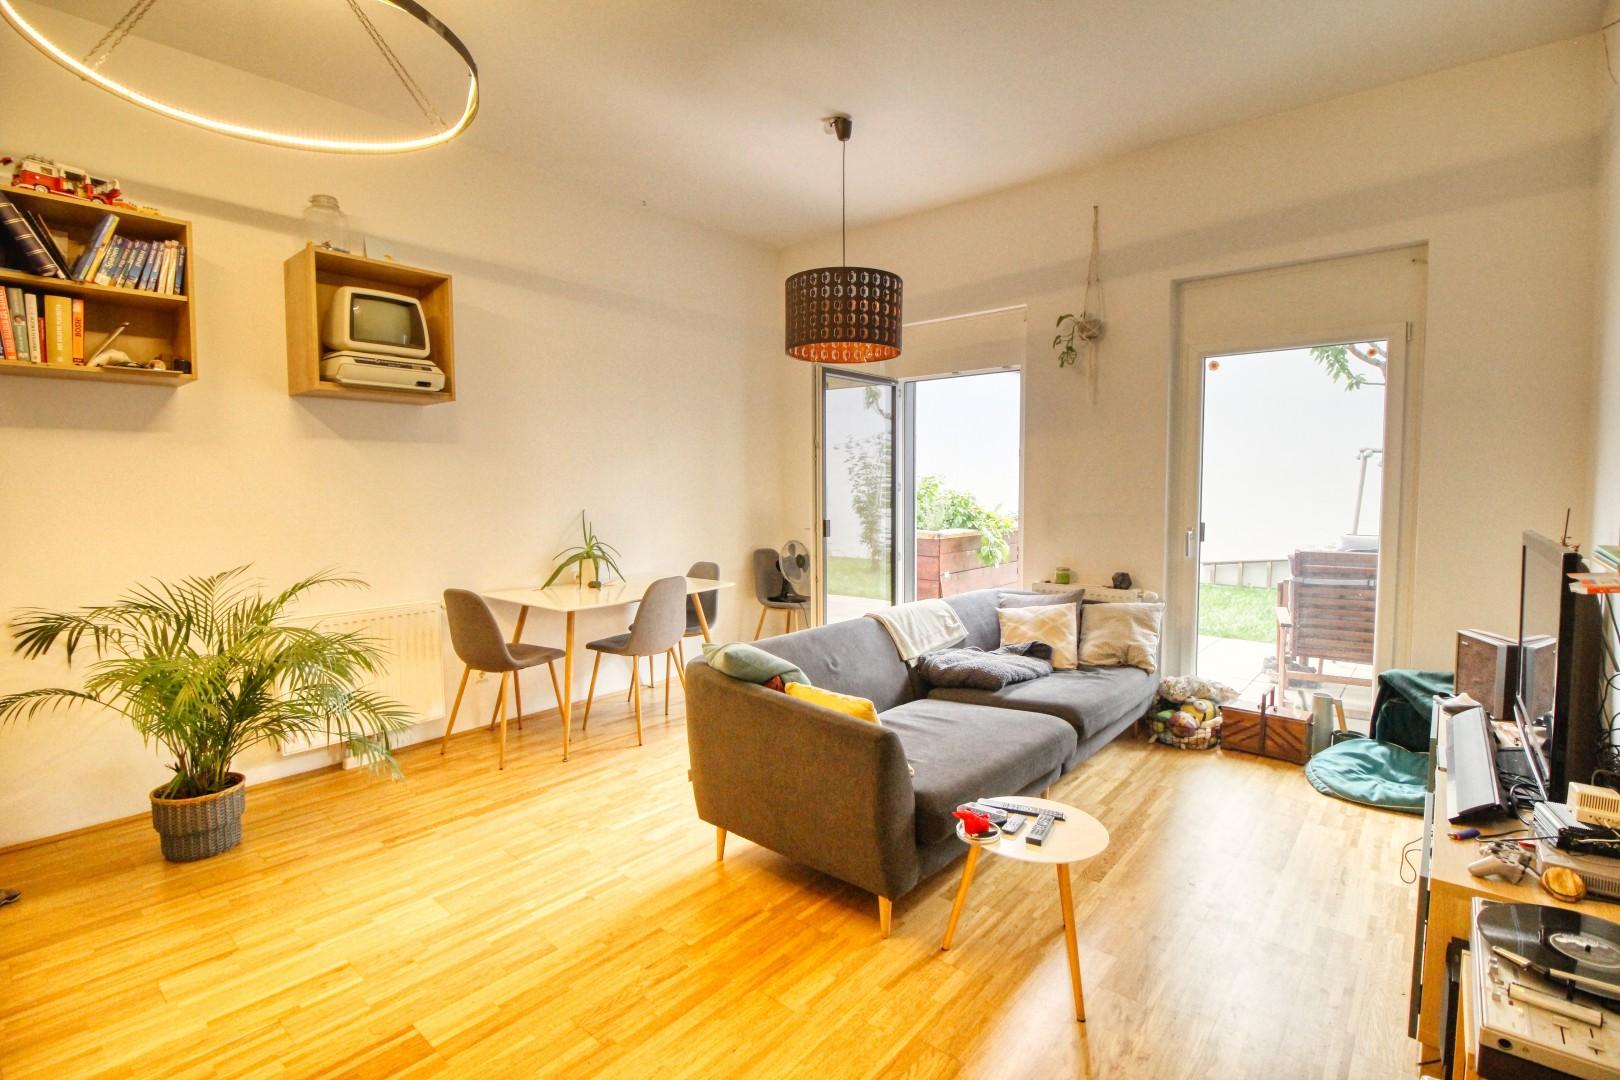 Perfekt !  Neuwertige Wohnung in Ruhelage ! 5min zum Donauspital